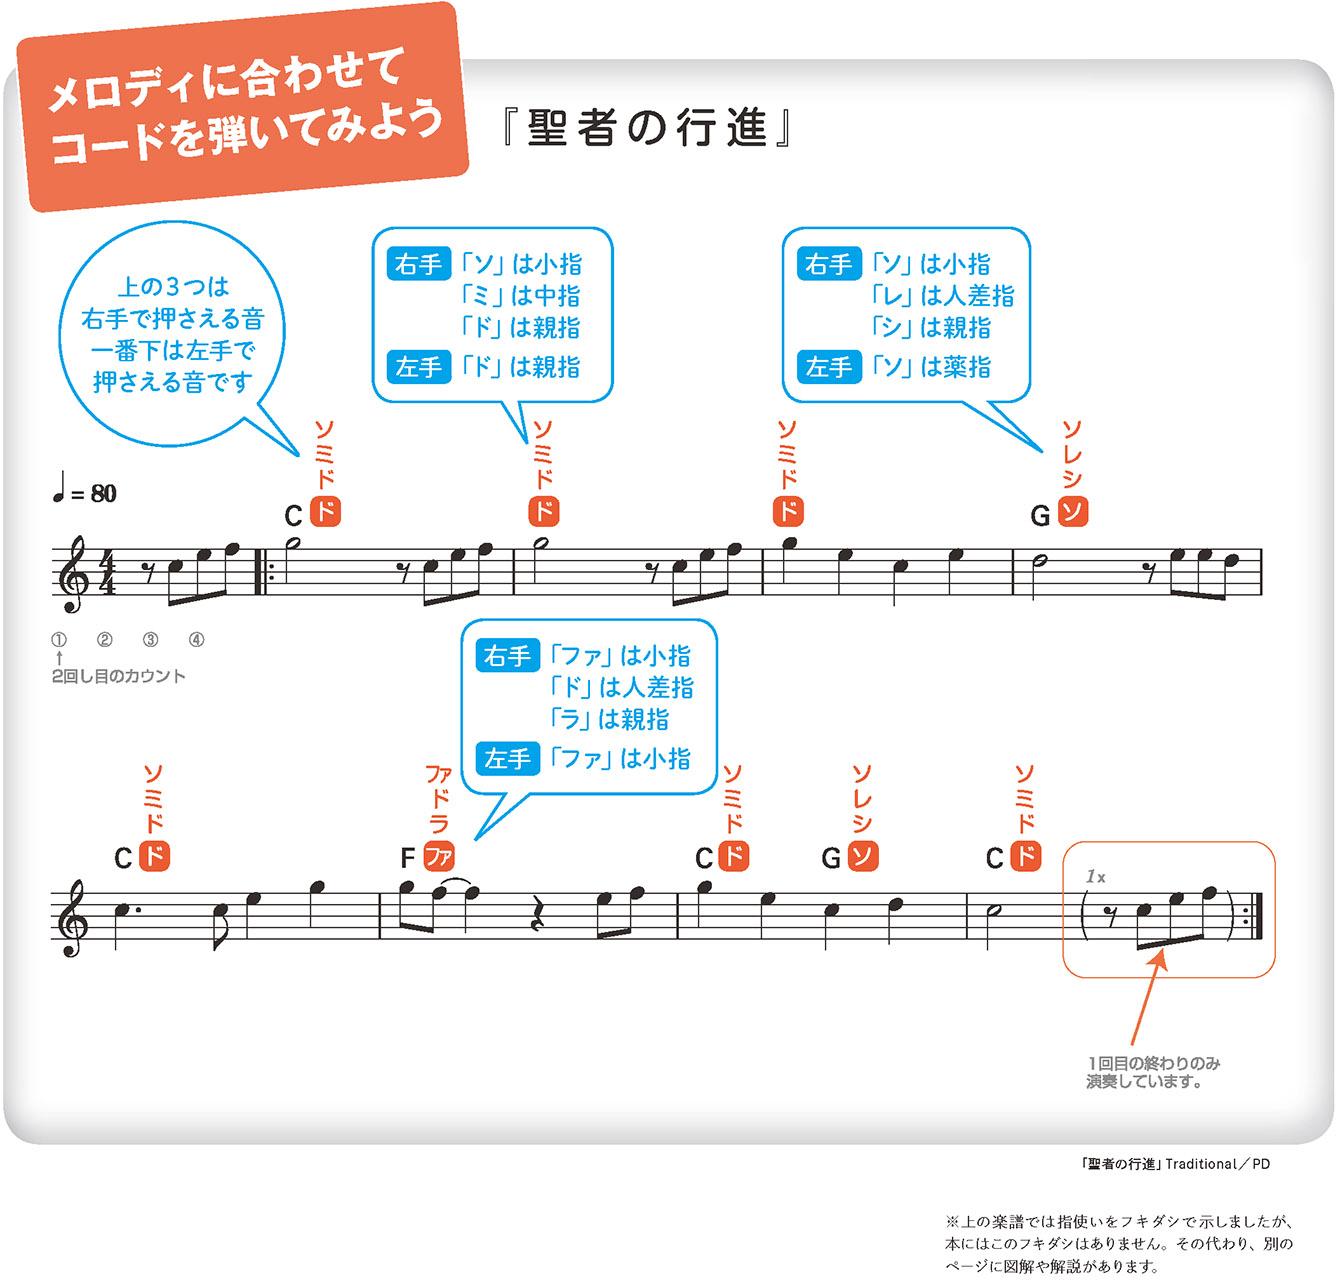 http://musicschool-navi.jp/columns/keion_v1_kb02.jpg